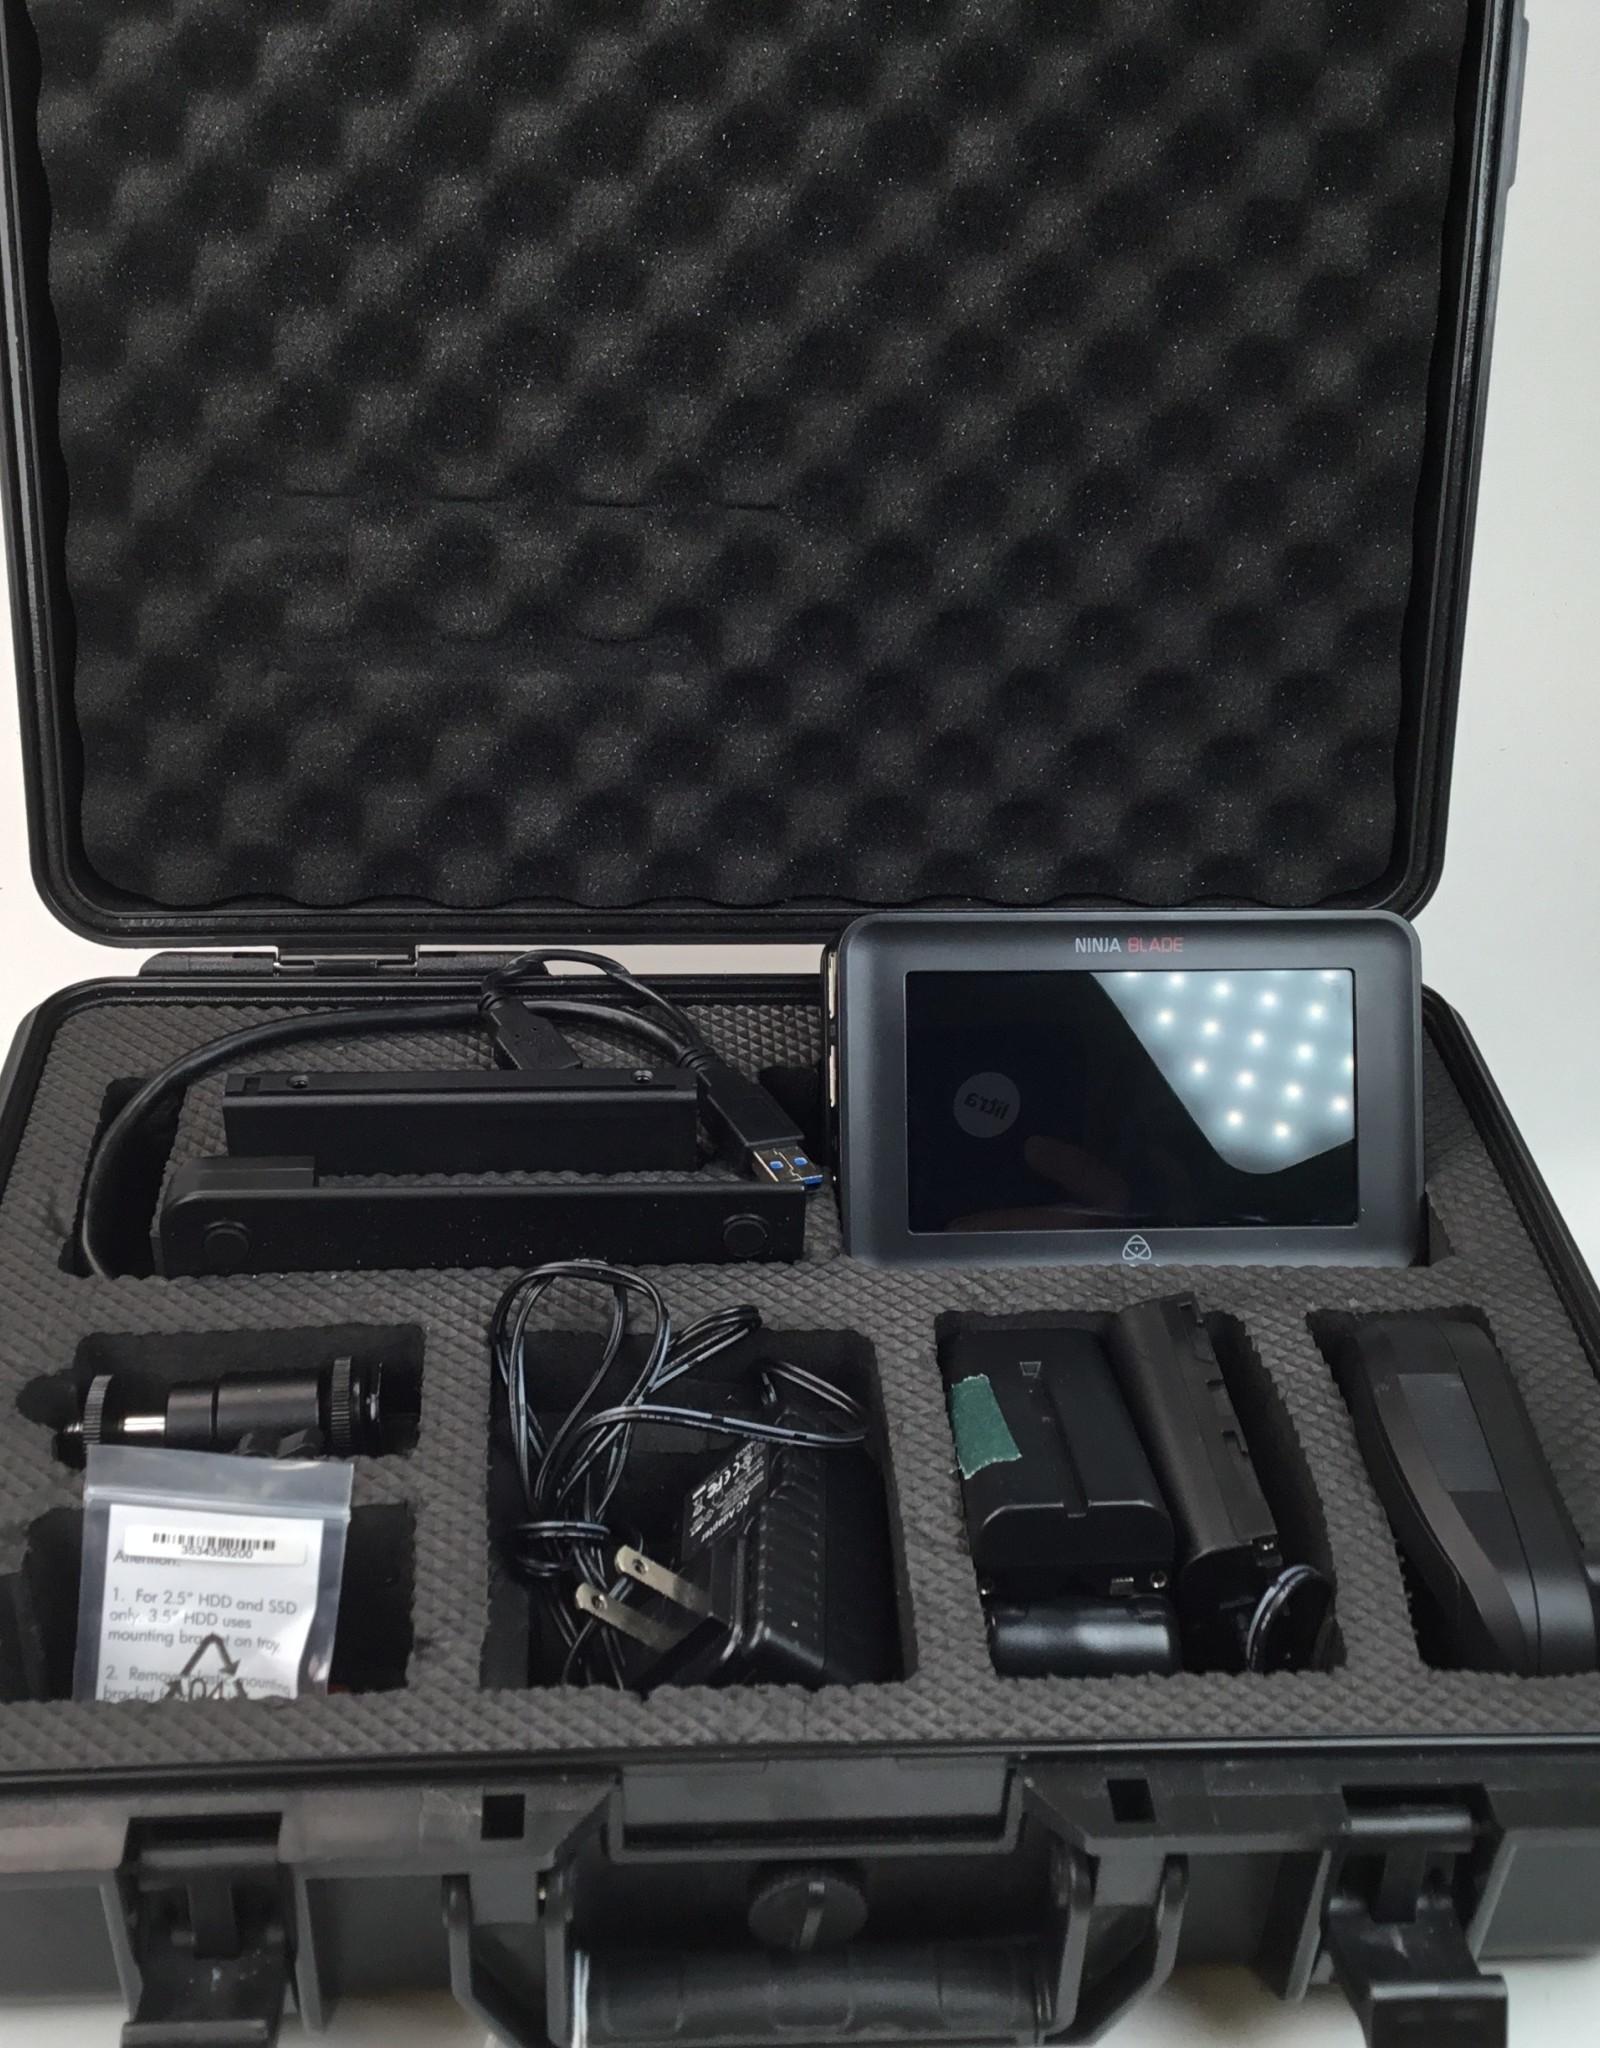 Atomos Ninja Blade Kit in Hard Case Used EX